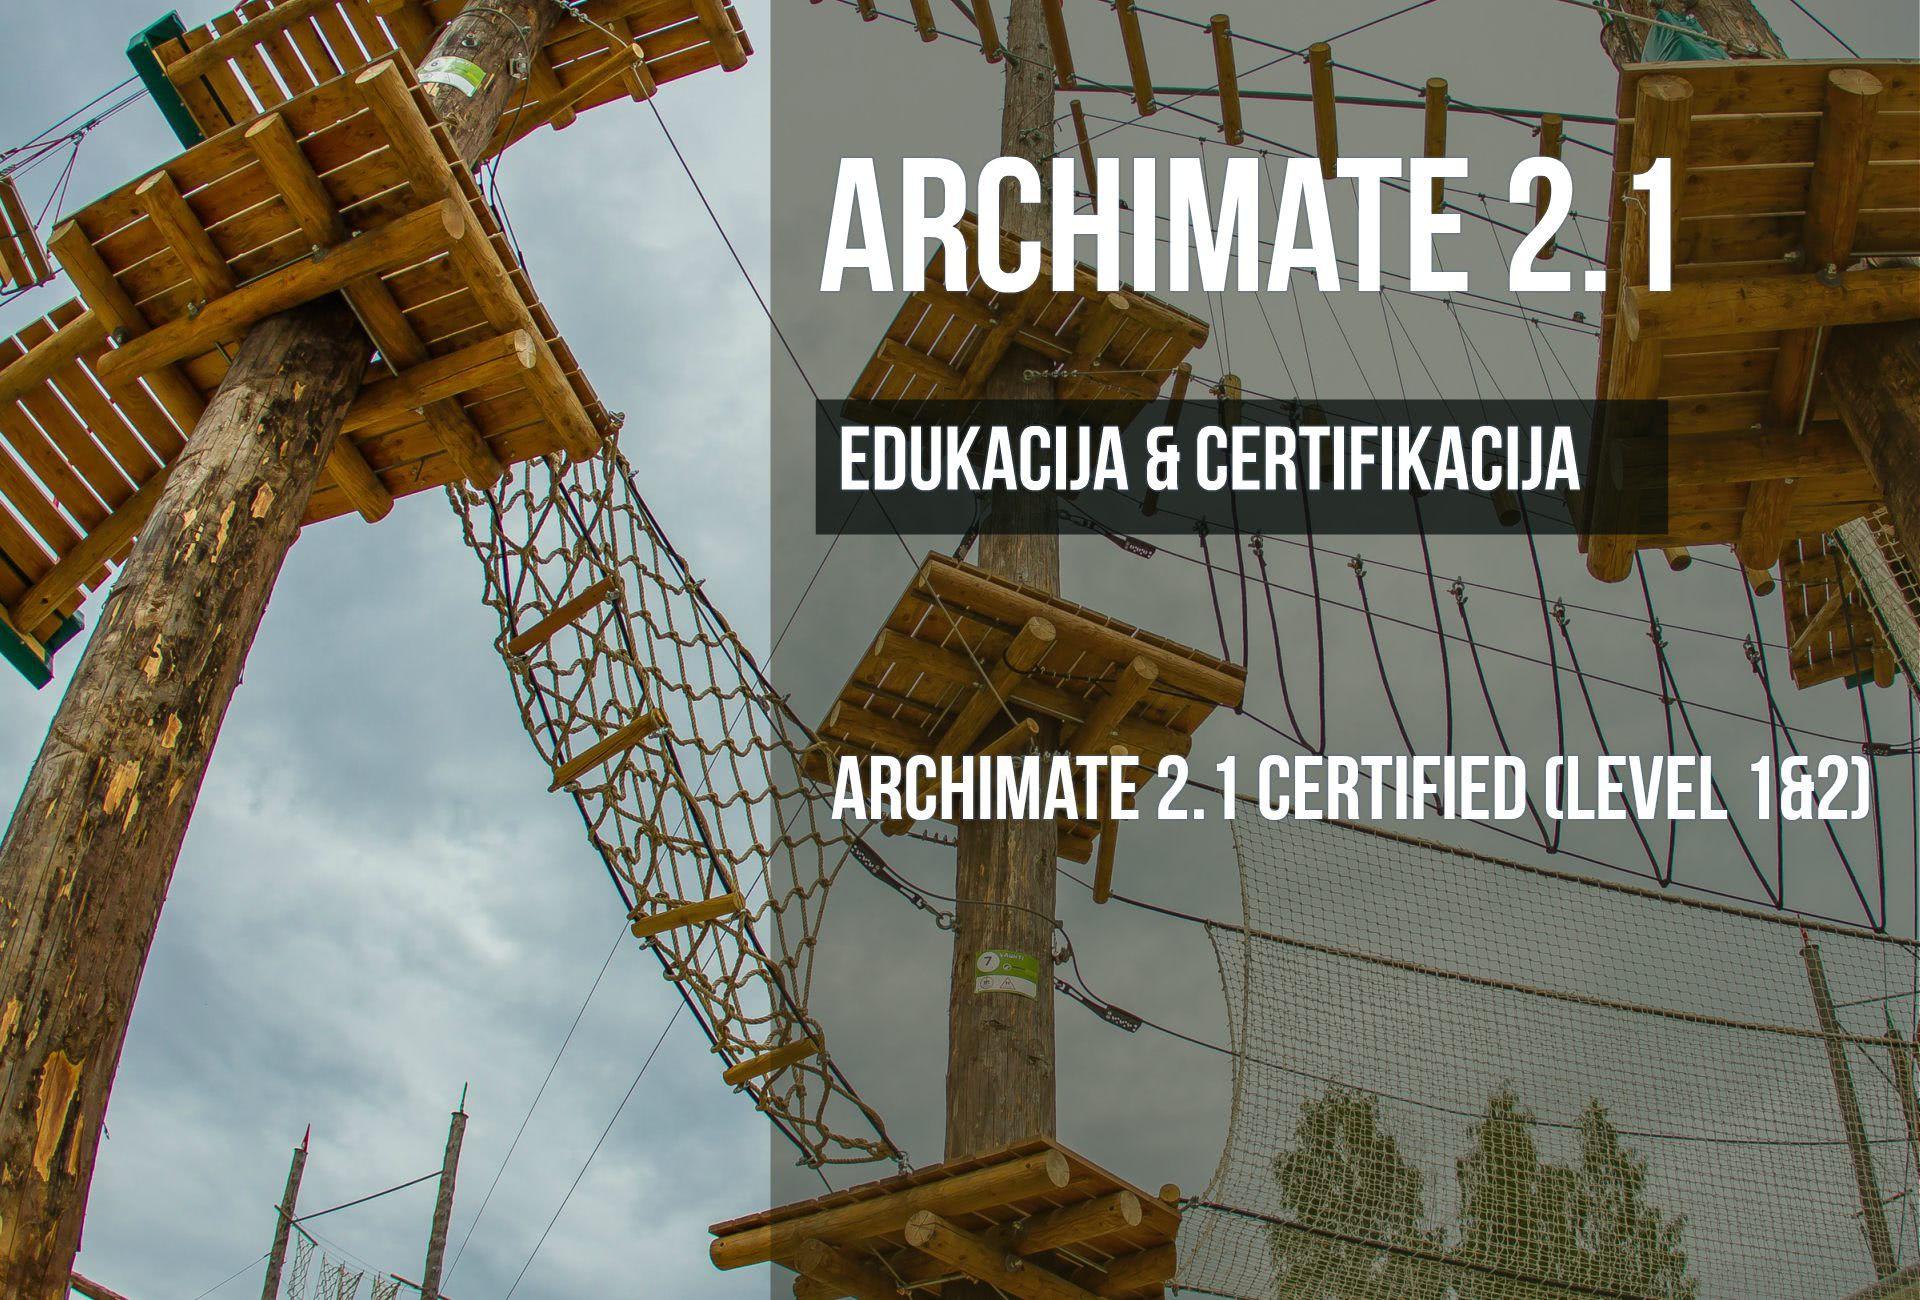 ITS Partner - Edukacija - Archimate Edukacija i certifikacija